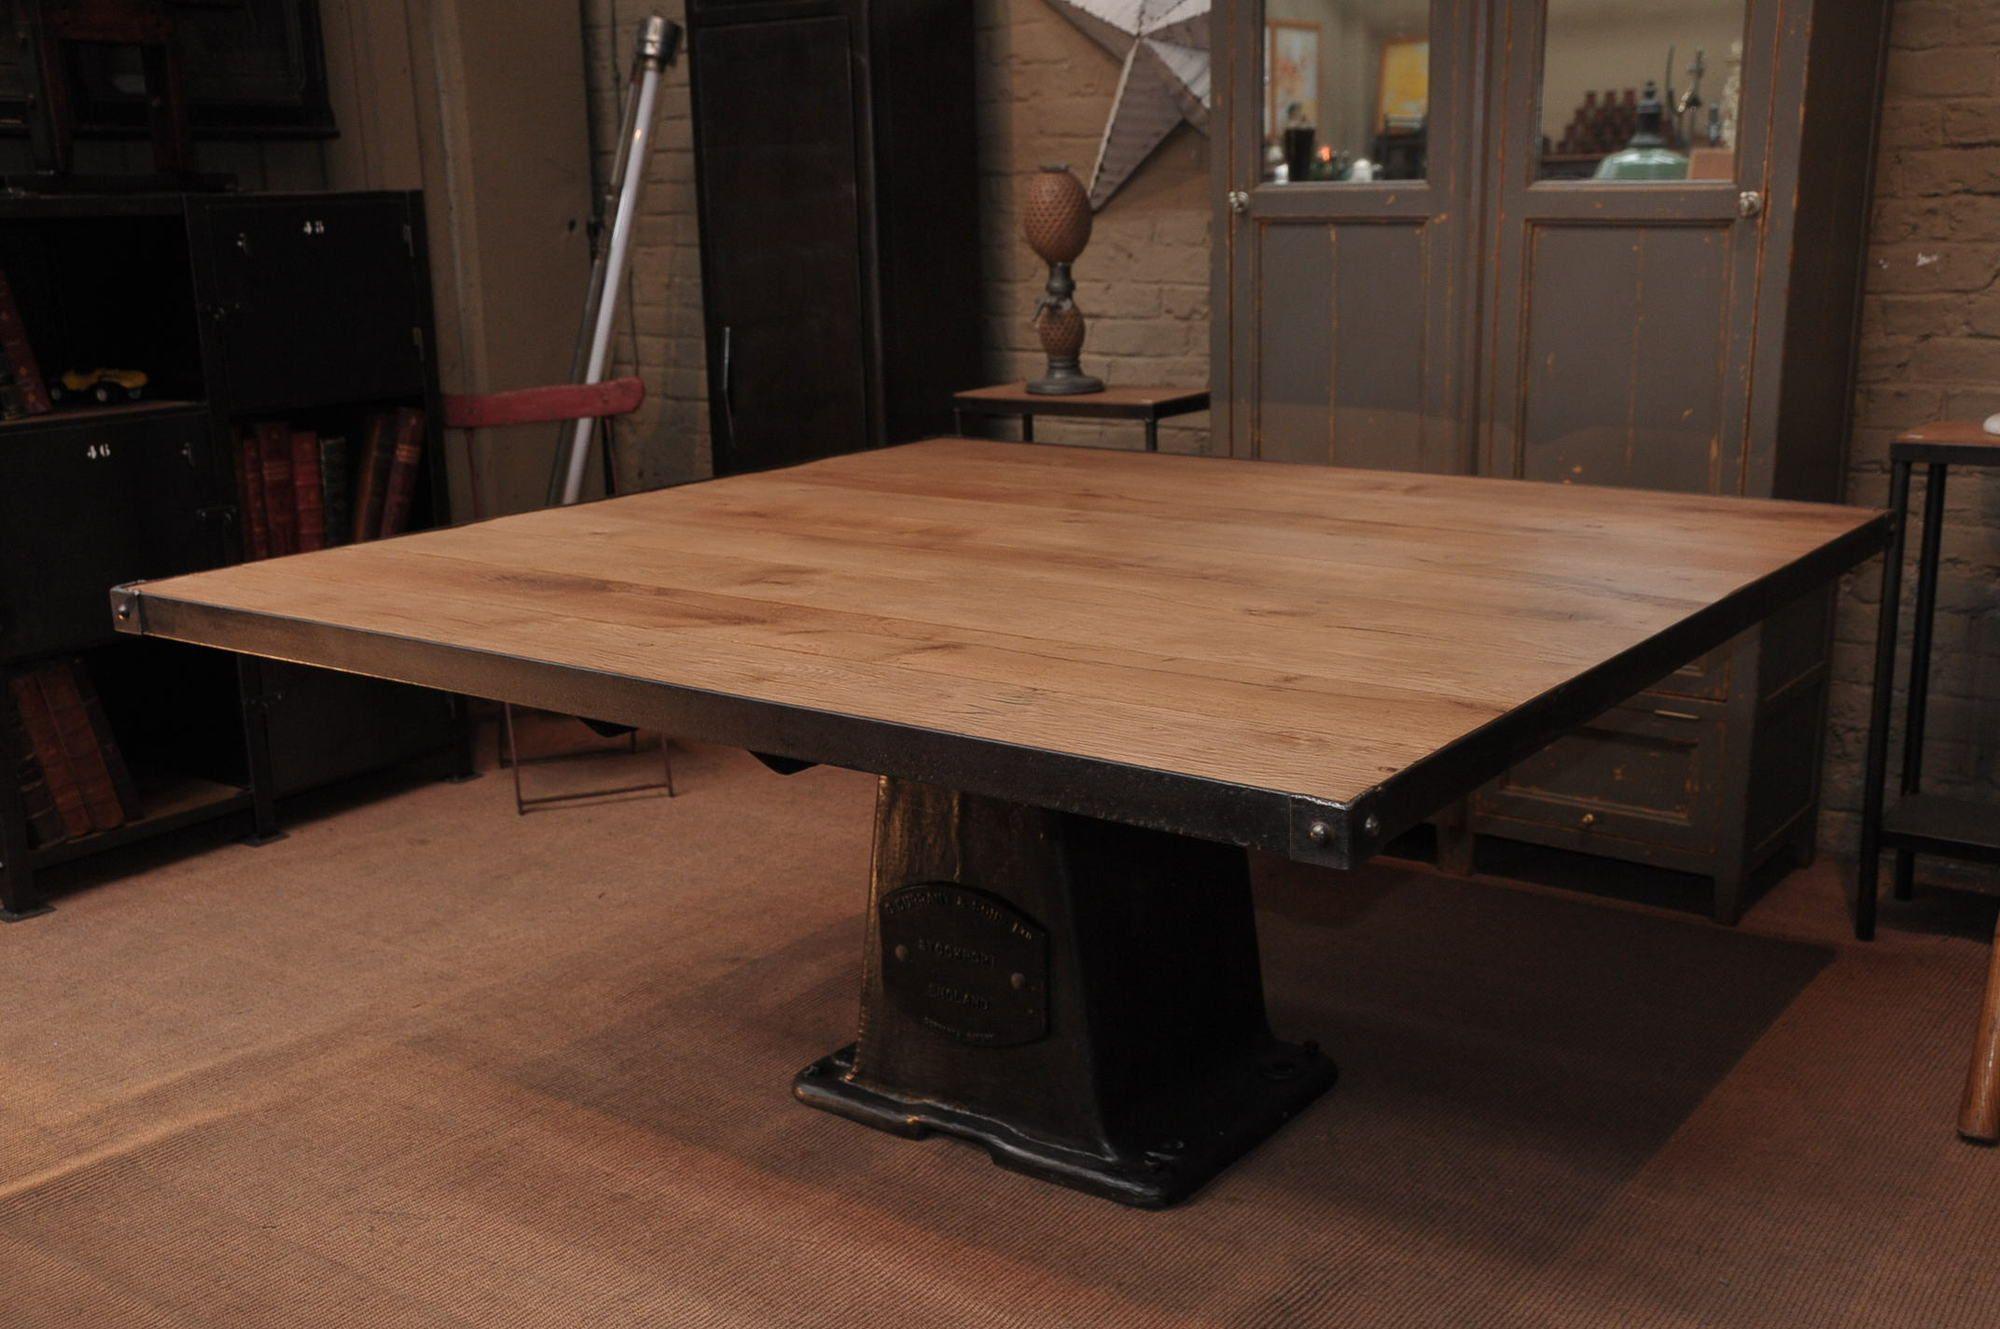 Table Industrielle Carree Fonte Et Chene Le Grenier Tables A Manger Carrees Table Salle A Manger Decoration Salle A Manger